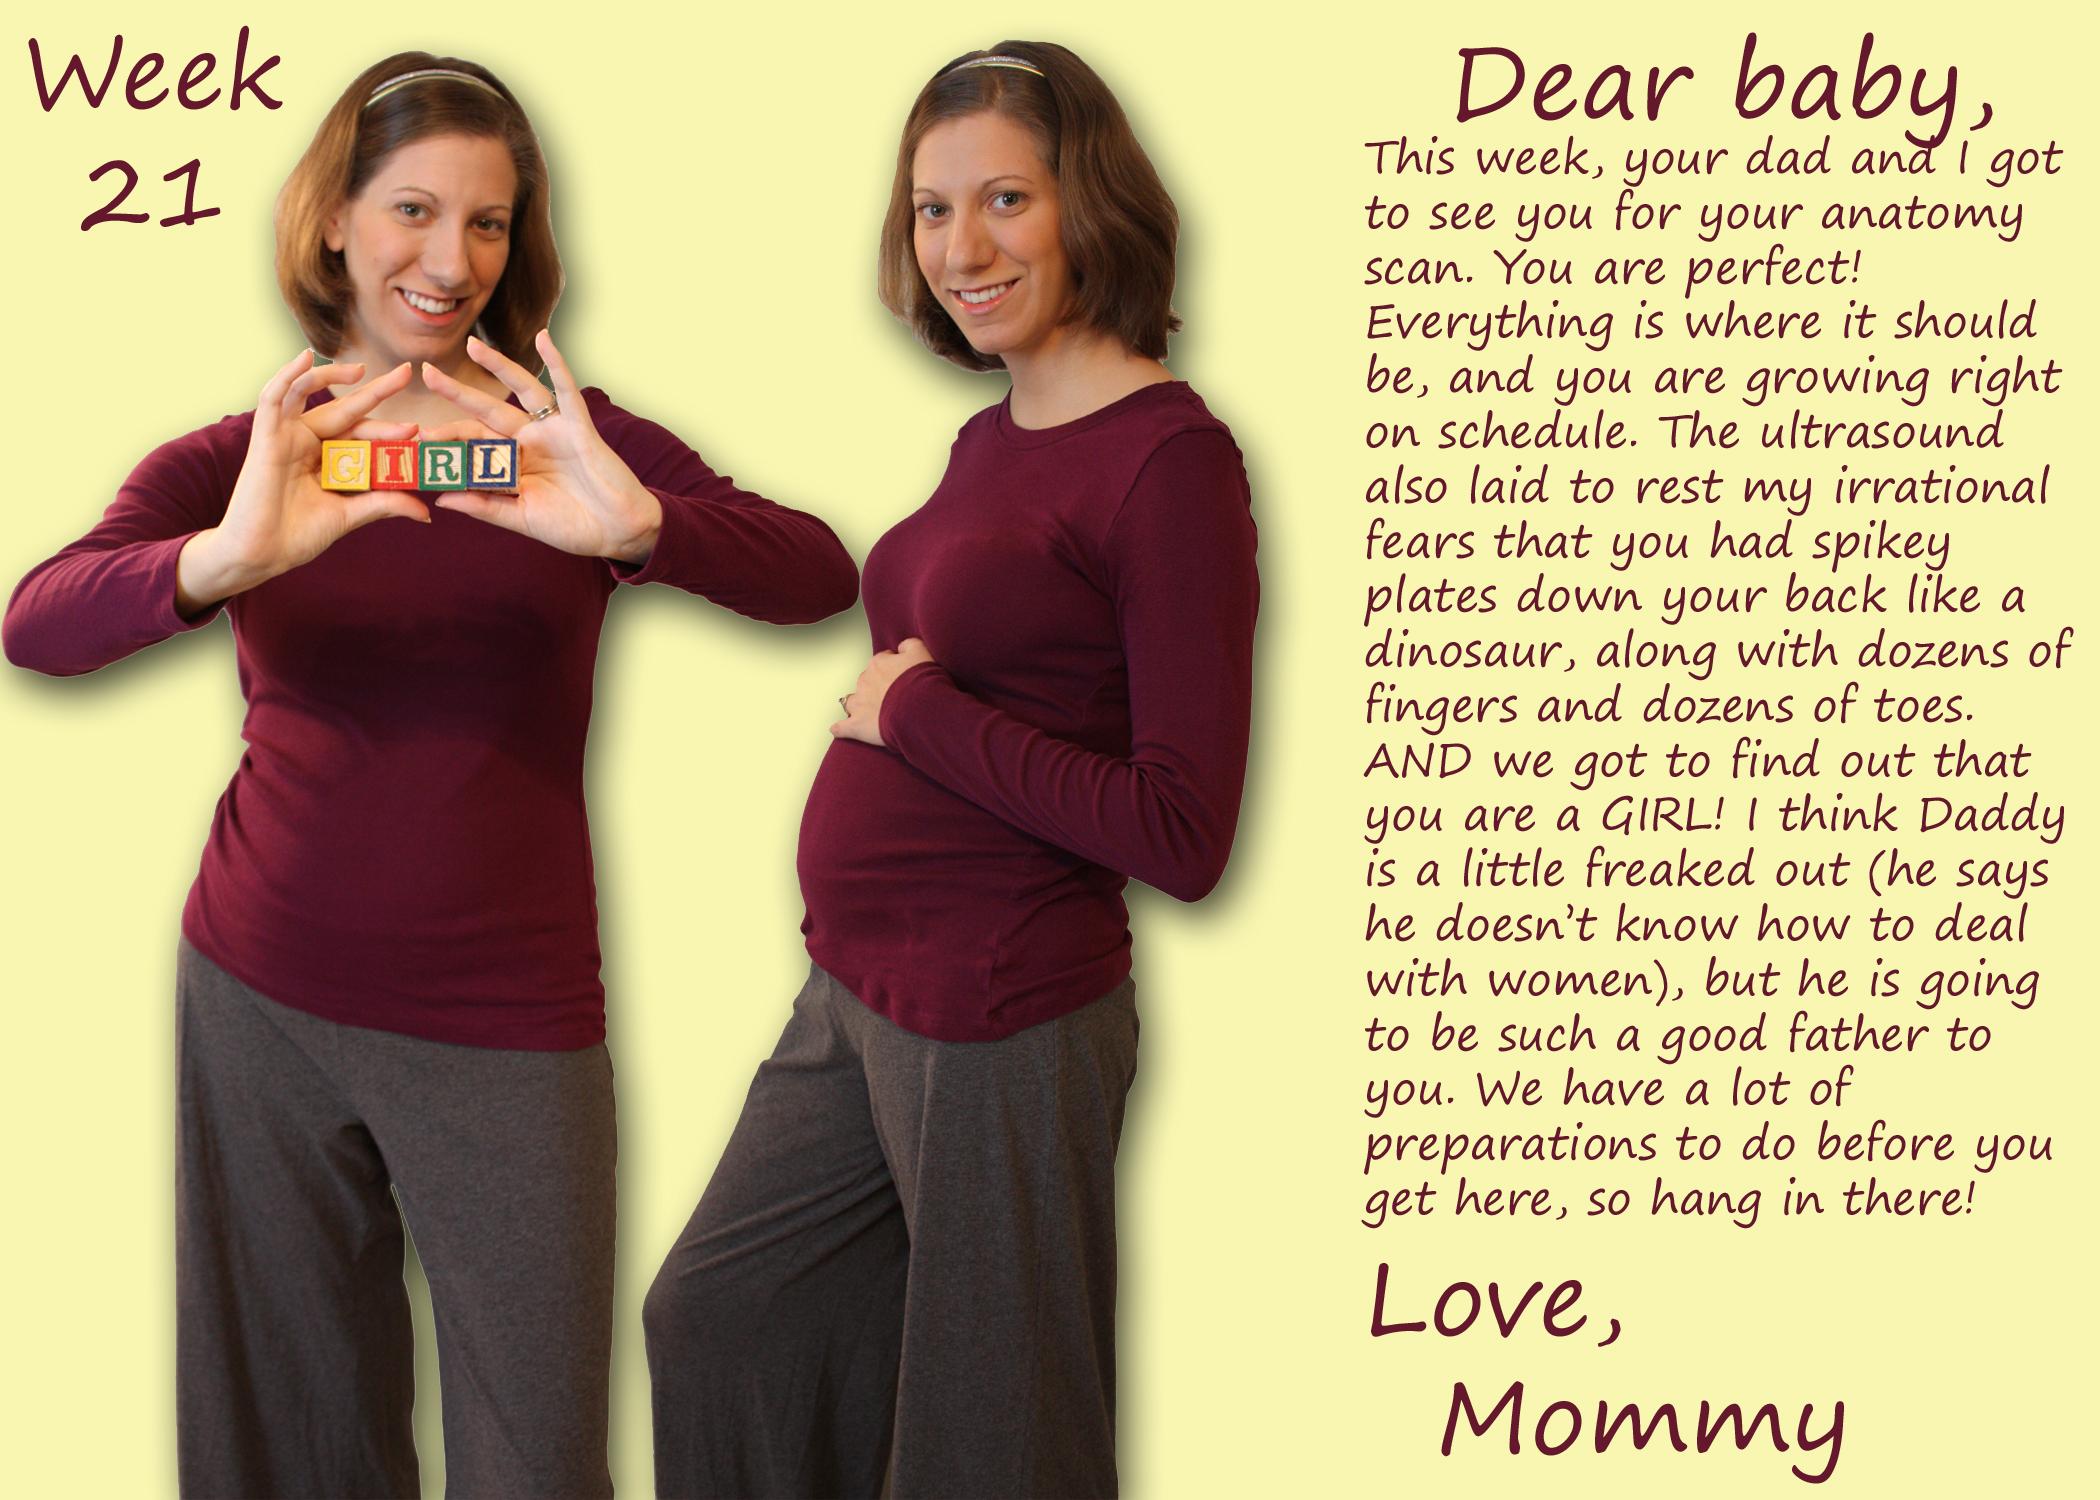 21 Weeks Pregnant and She's a Girl! - Joyful Abode